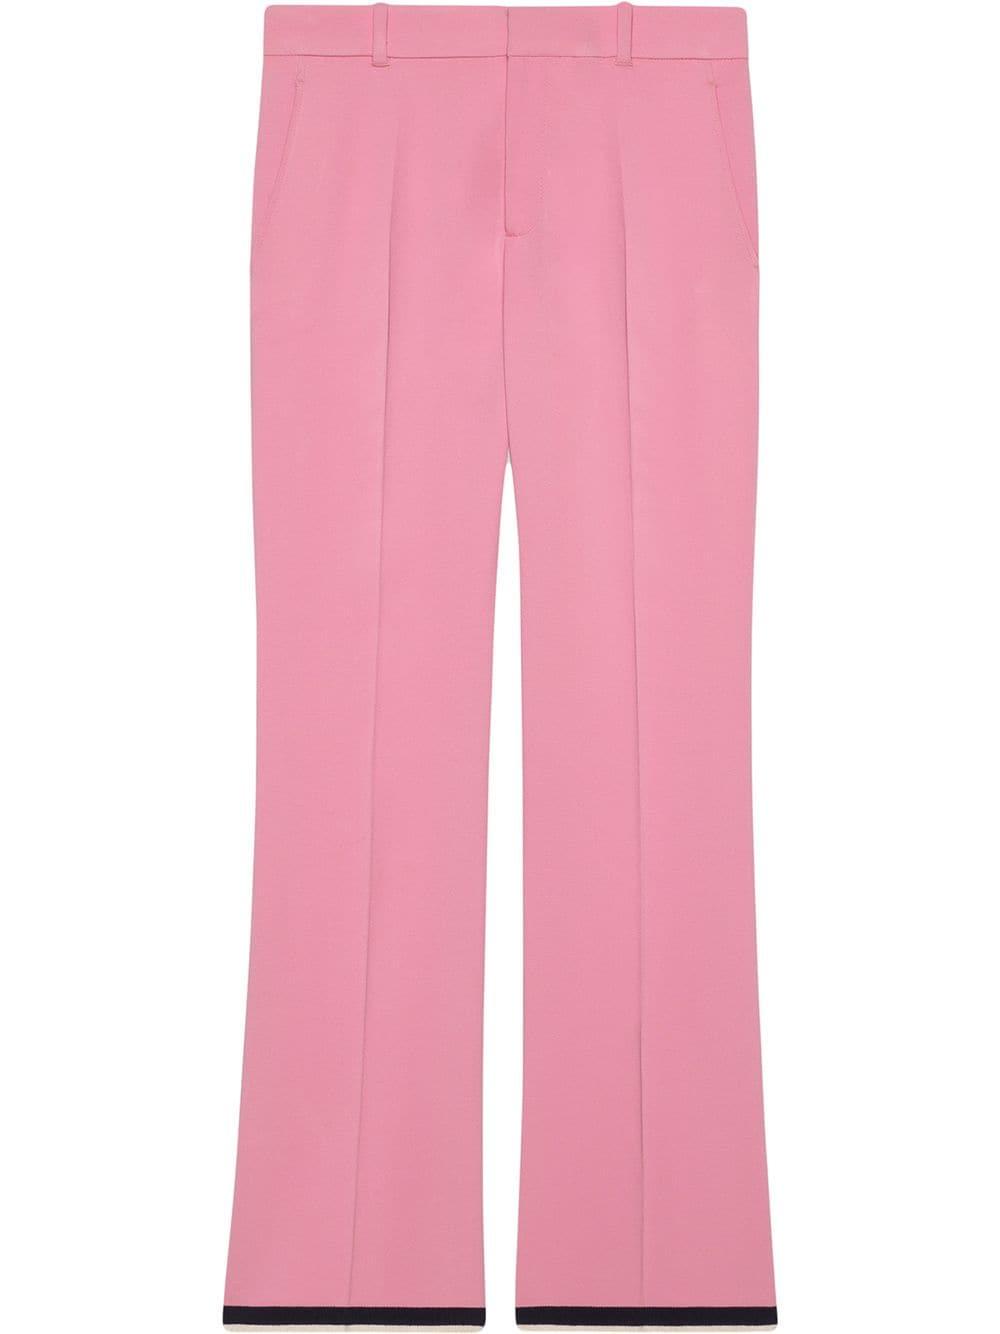 Pantaloni bootcut rosa in viscosa stretch aderenti alla gamba GUCCI | Pantaloni | 558057-ZKR015183